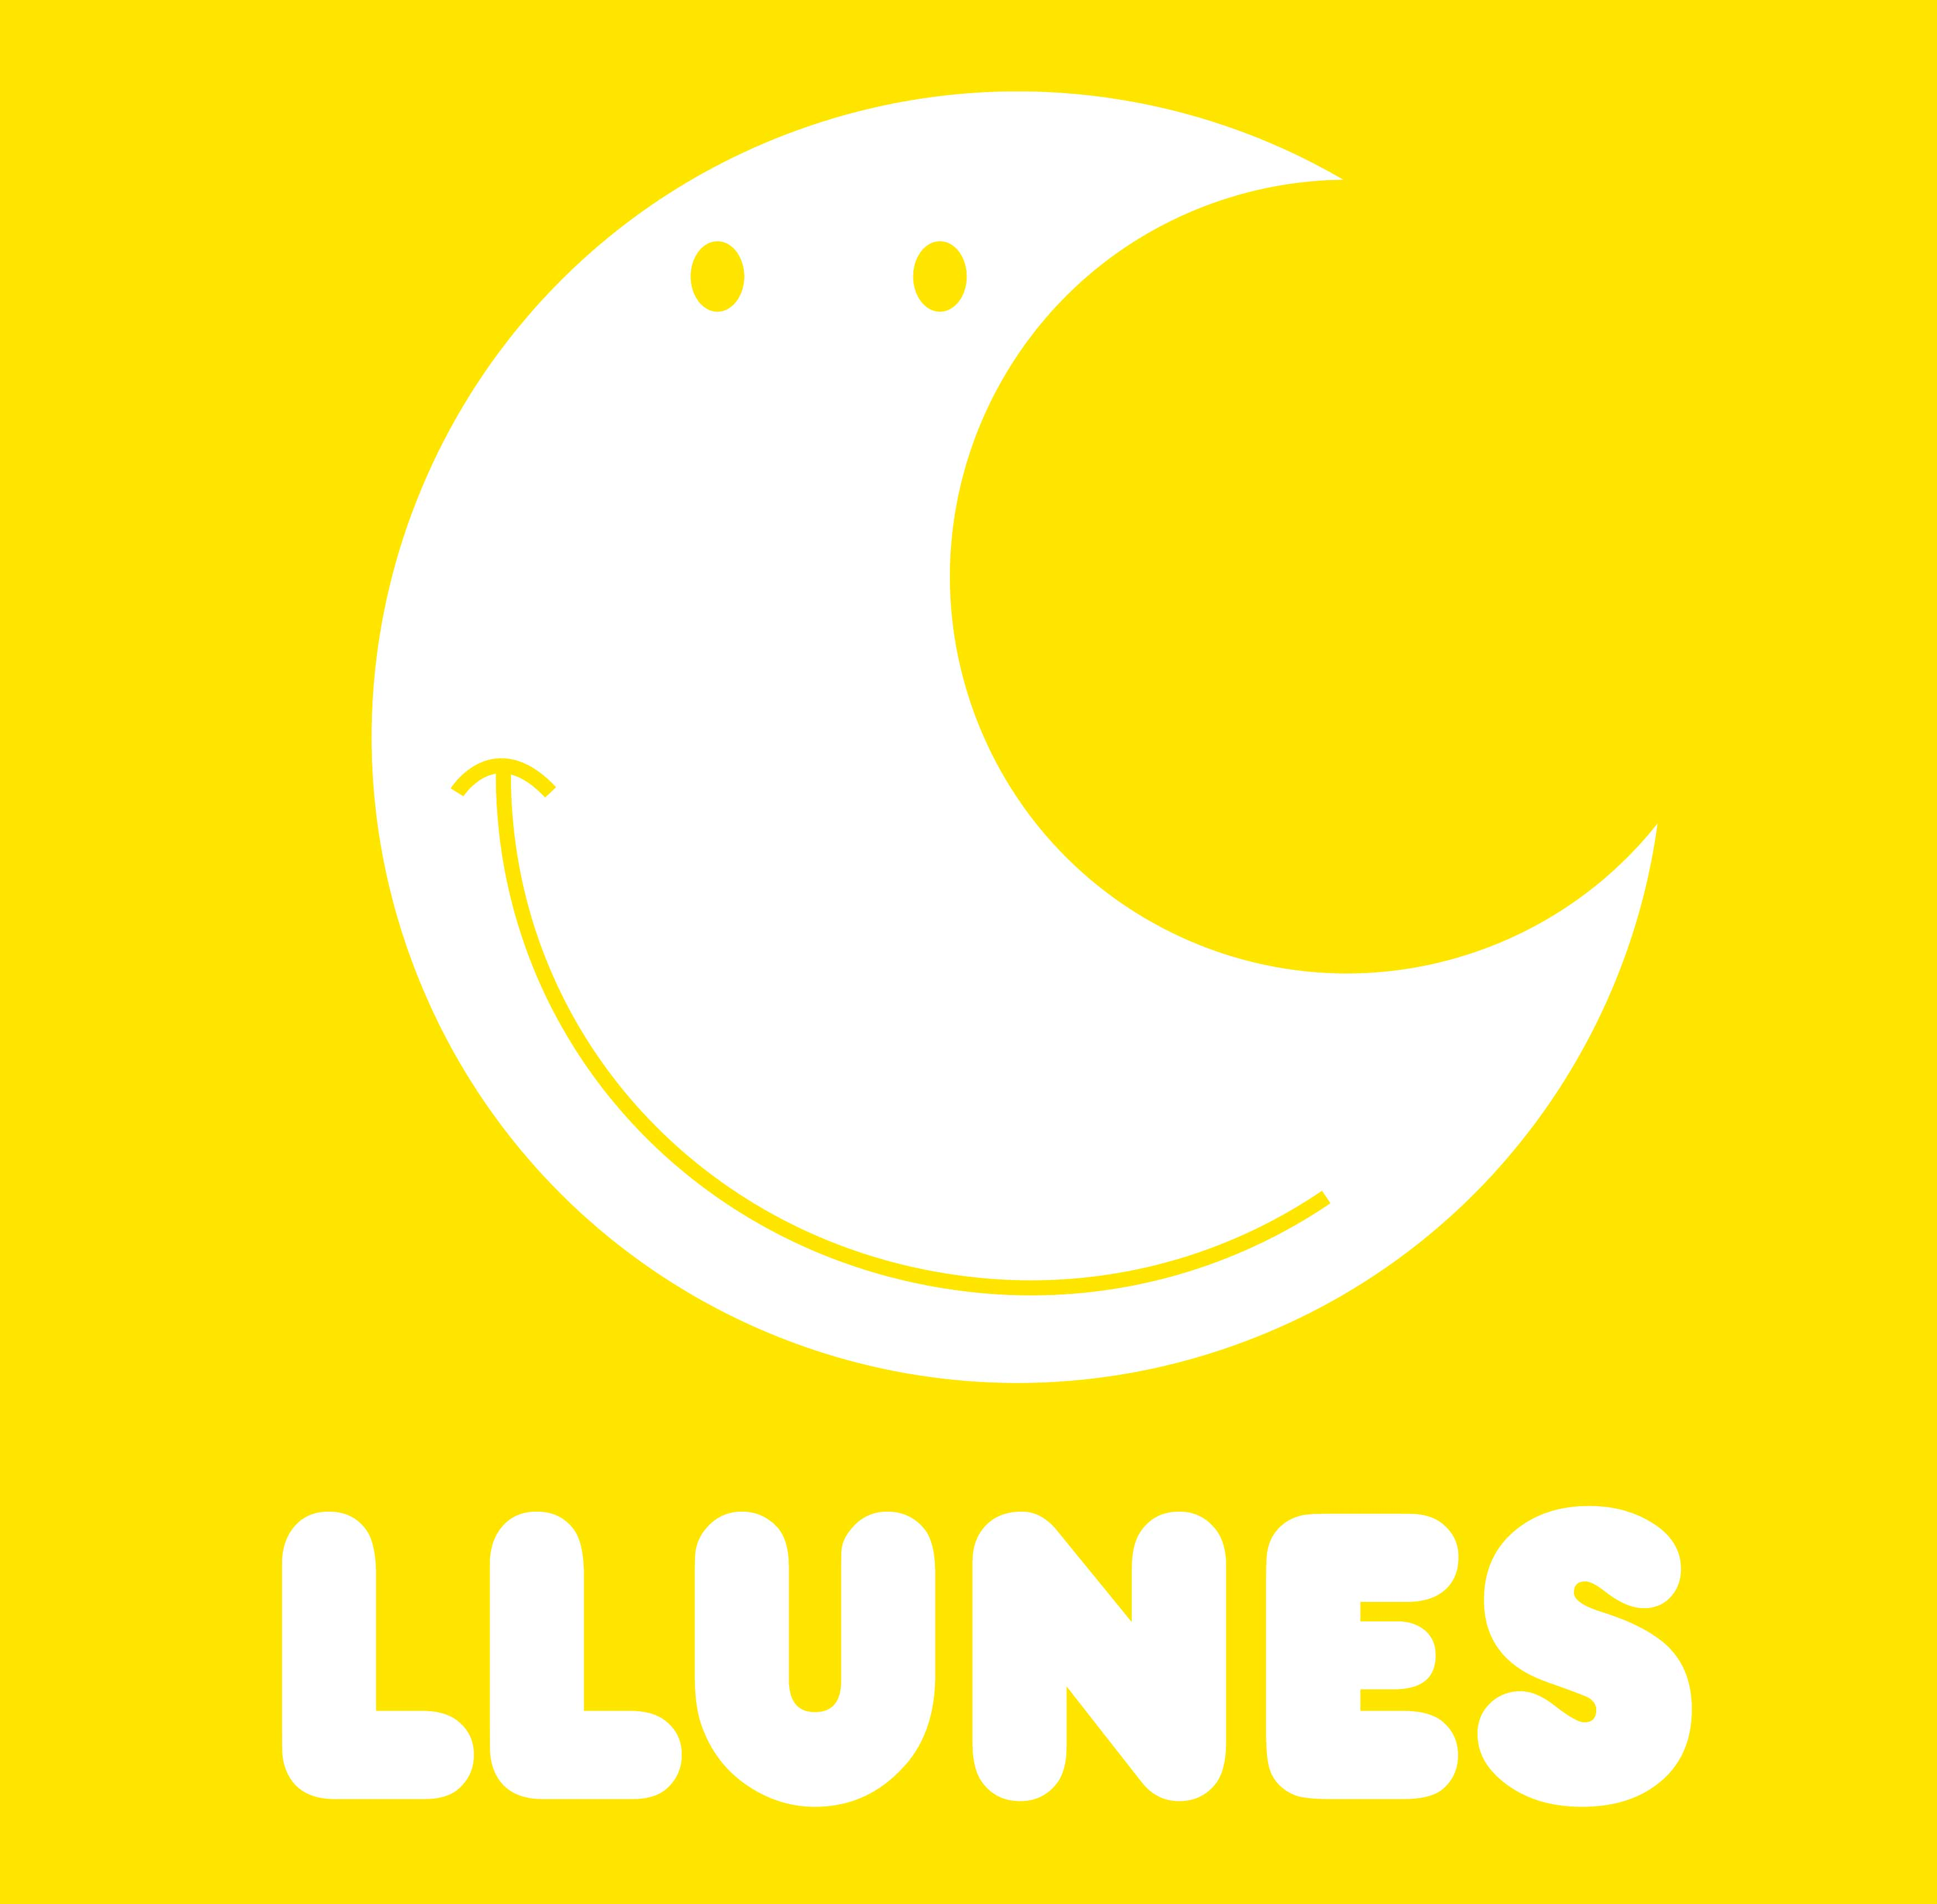 llunes